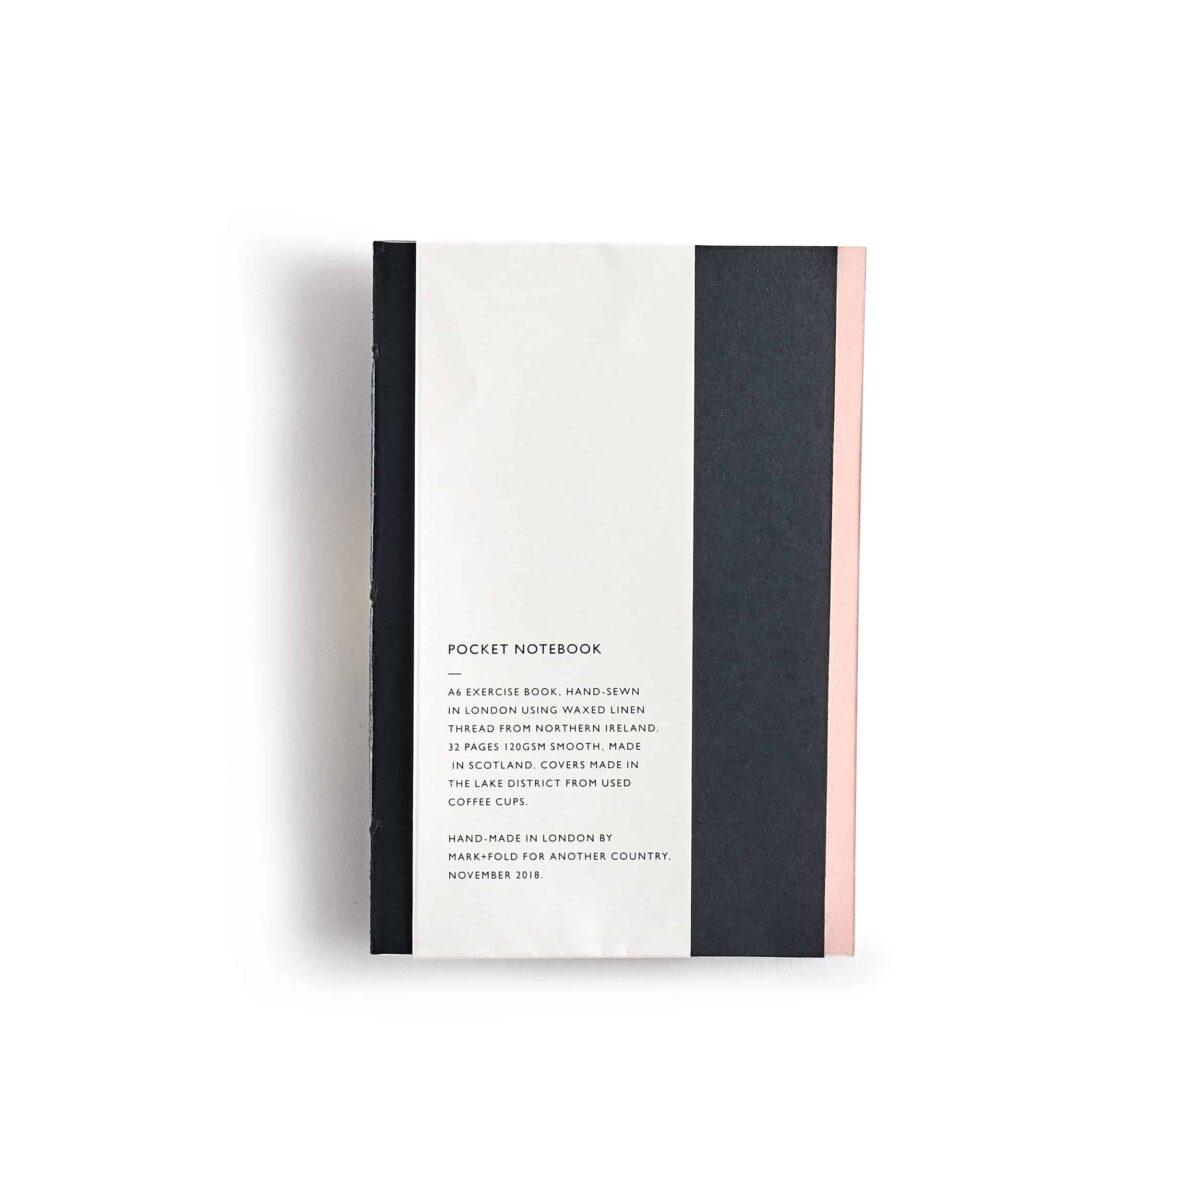 Pocket Notebook, AC+Mark&Fold-Another-Country-Photo Credit Yeshen Venema-web ready-21.11.185380